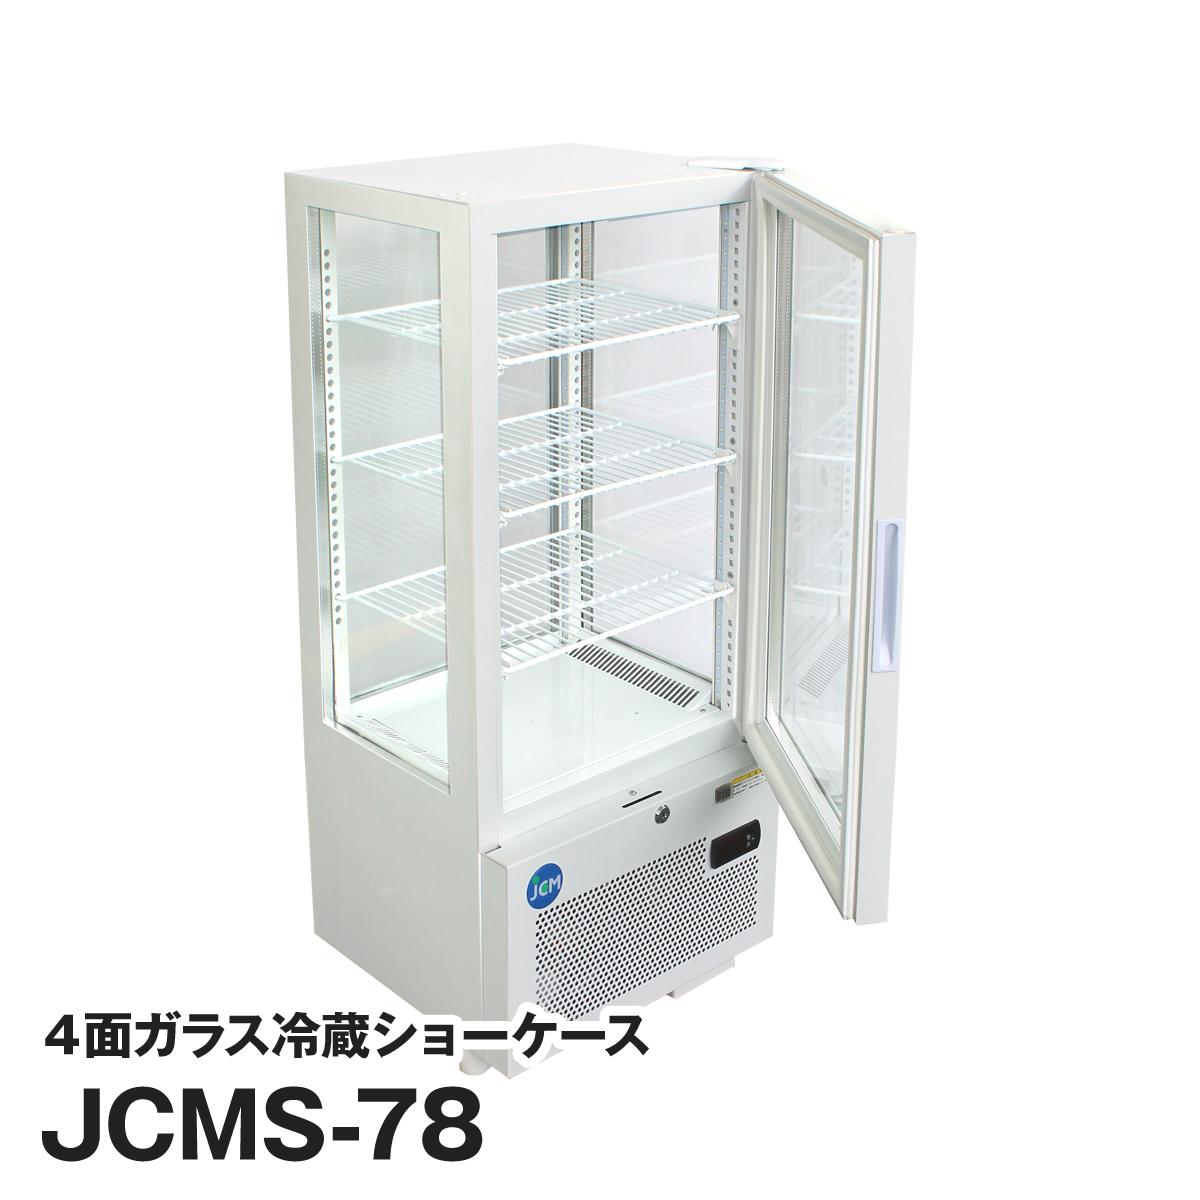 JCM社製 業務用 保冷庫 冷蔵庫 78L 4面 ガラス 冷蔵ショーケースJCMS-78 新品